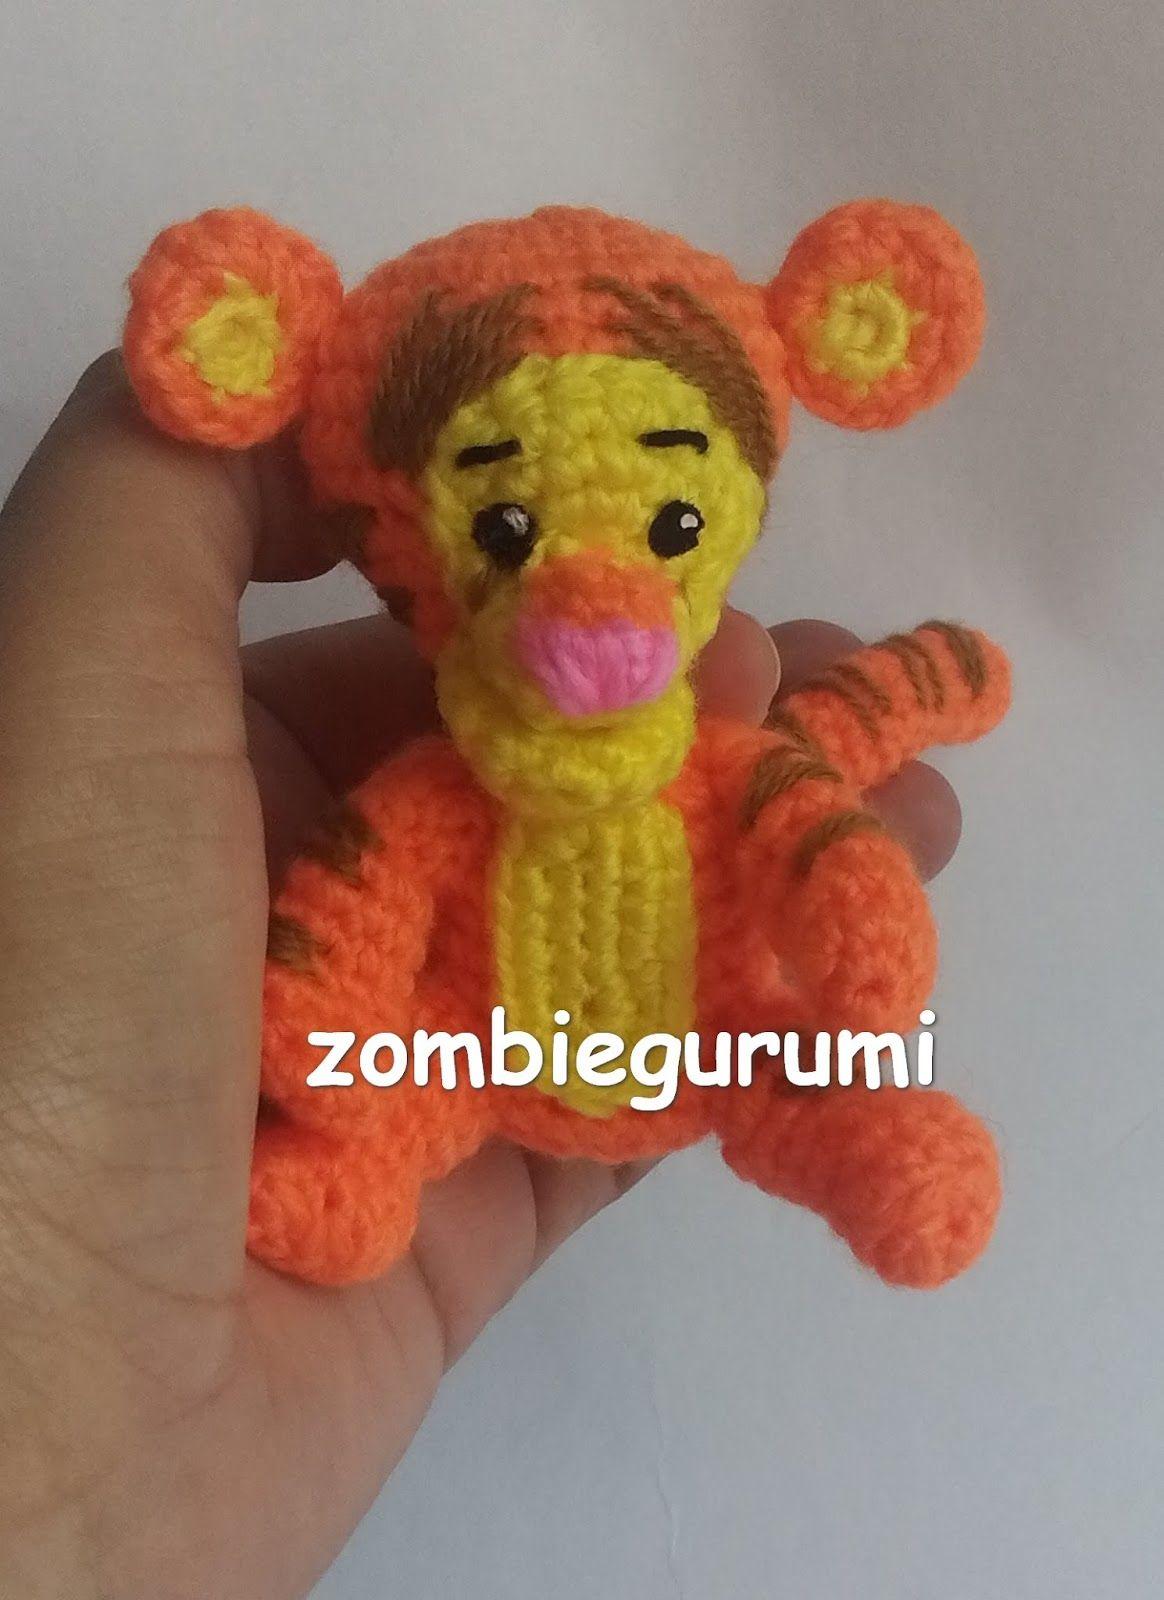 patron gratis tiger amigurumi | tejido a crochet | Pinterest ...